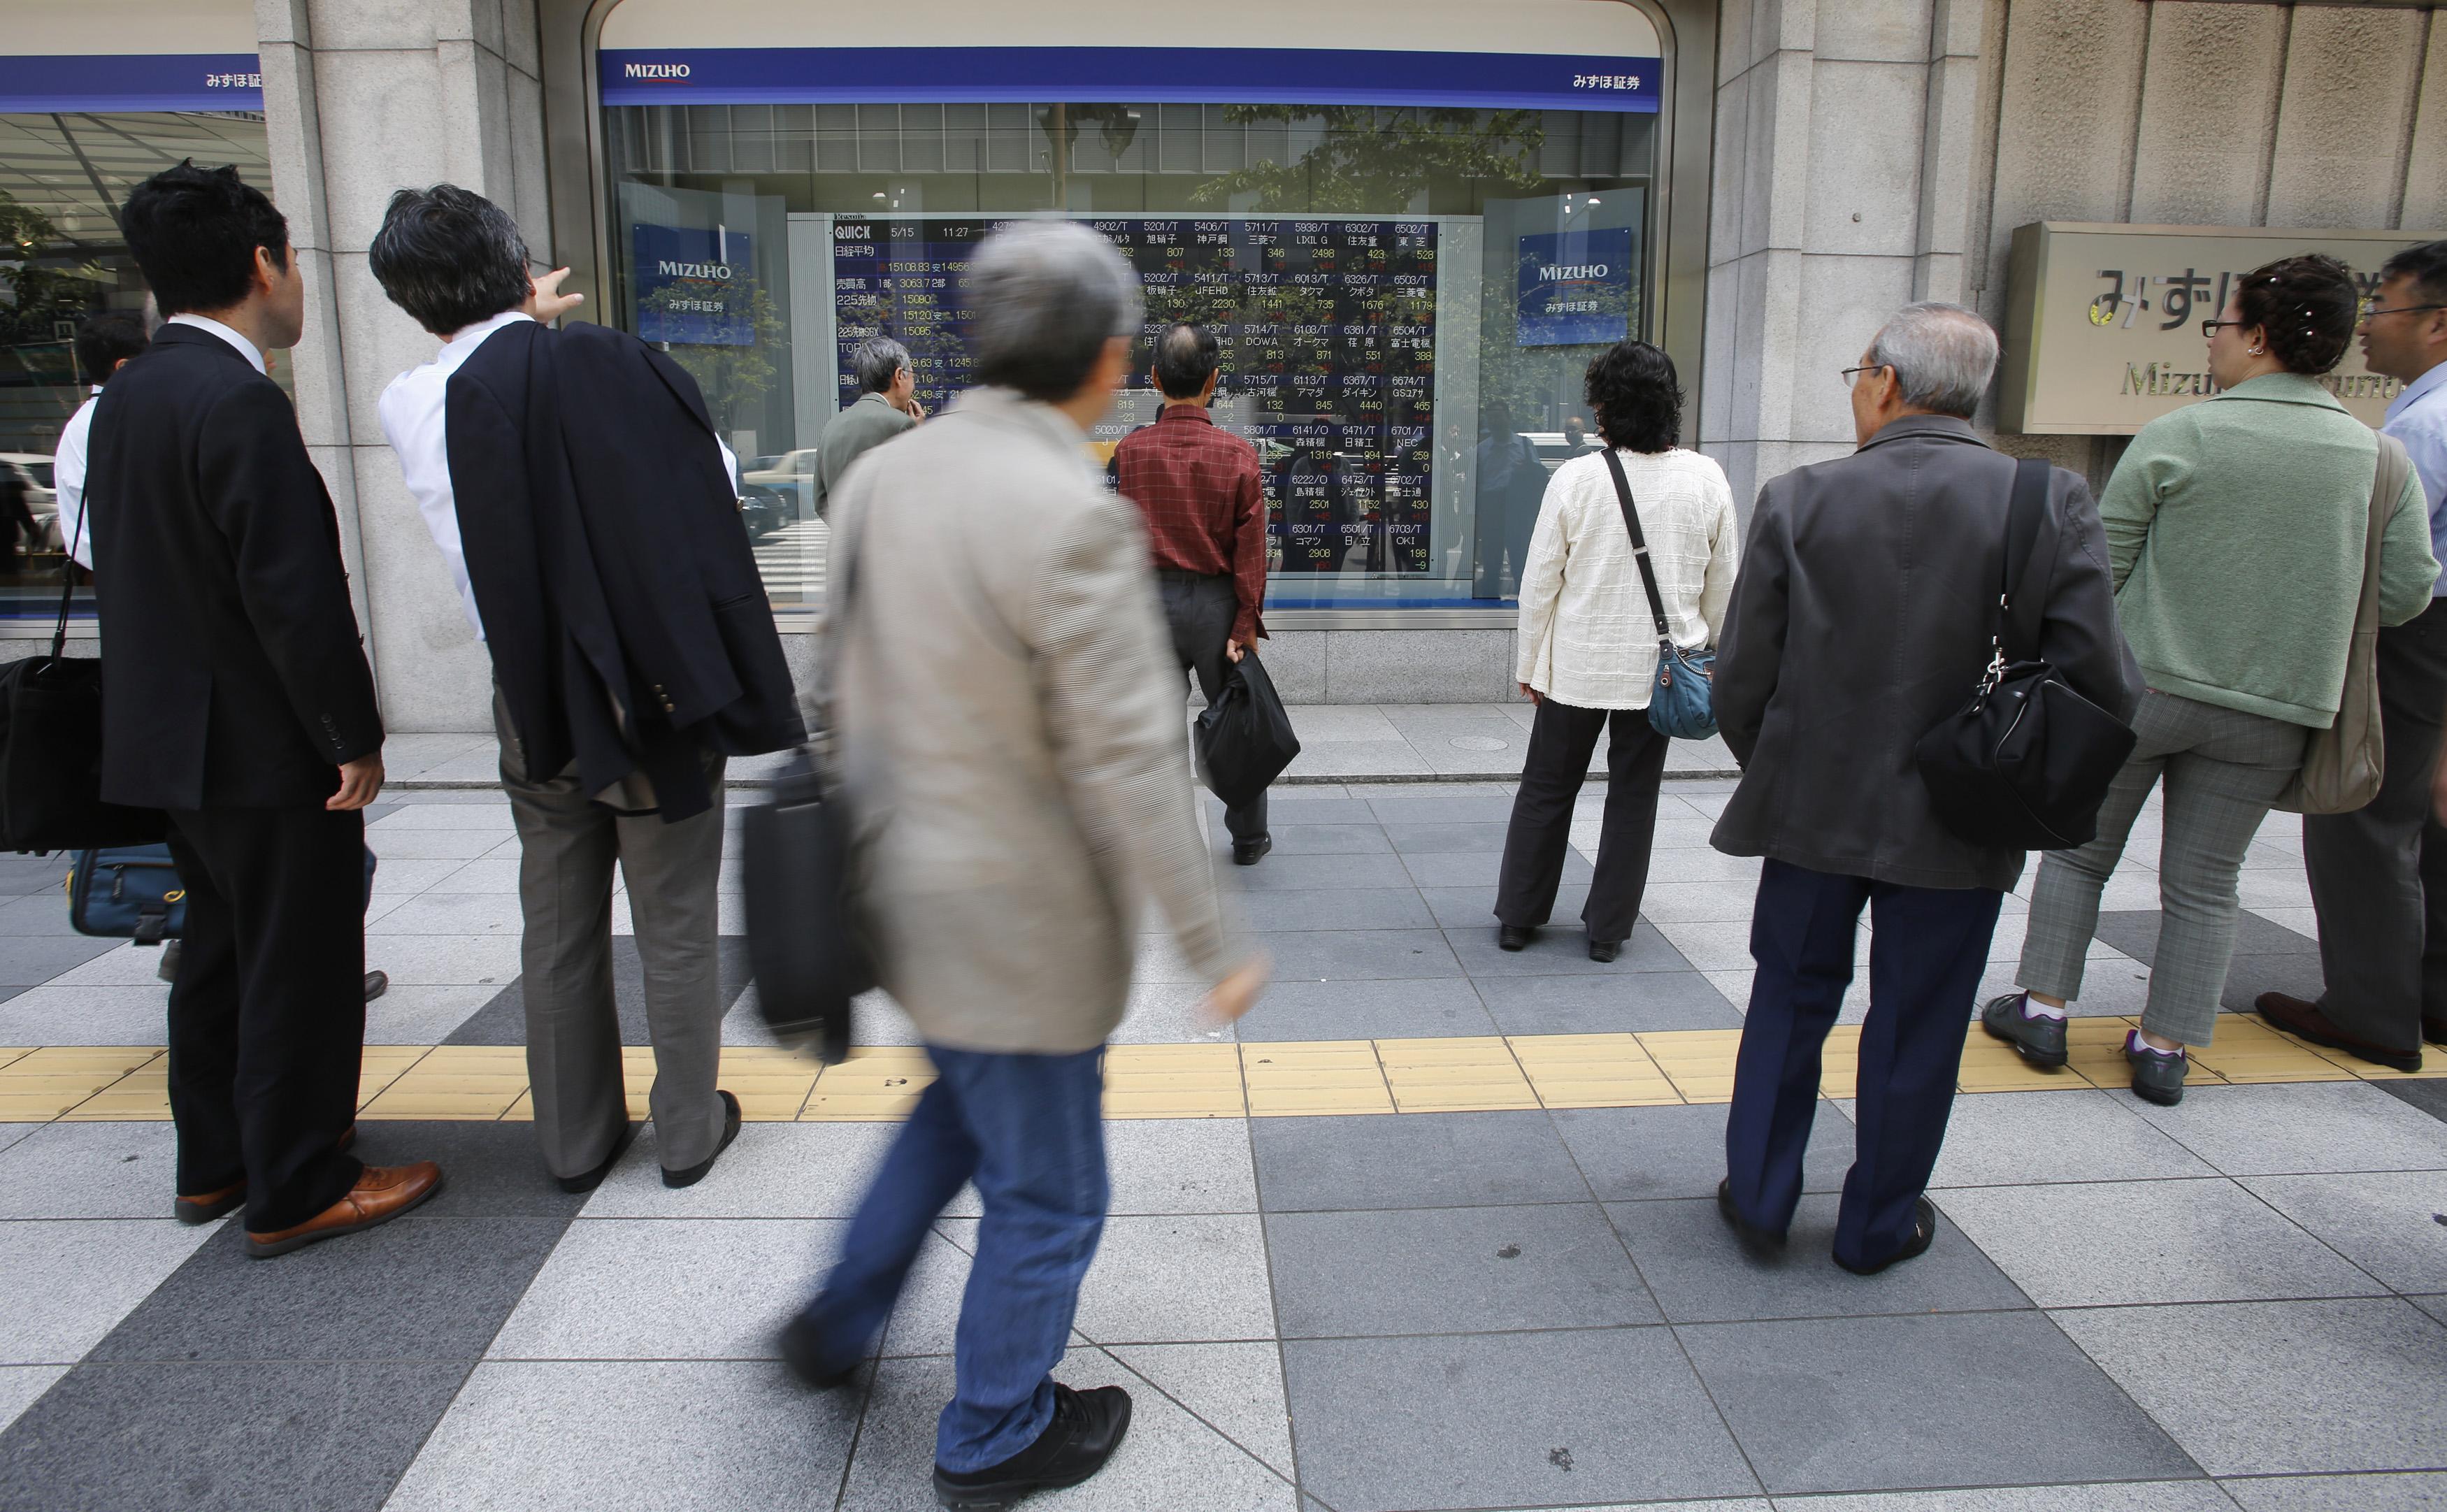 People look at a stock quotation board outside a brokerage in Tokyo May 15, 2013. REUTERS/Toru Hanai/Files